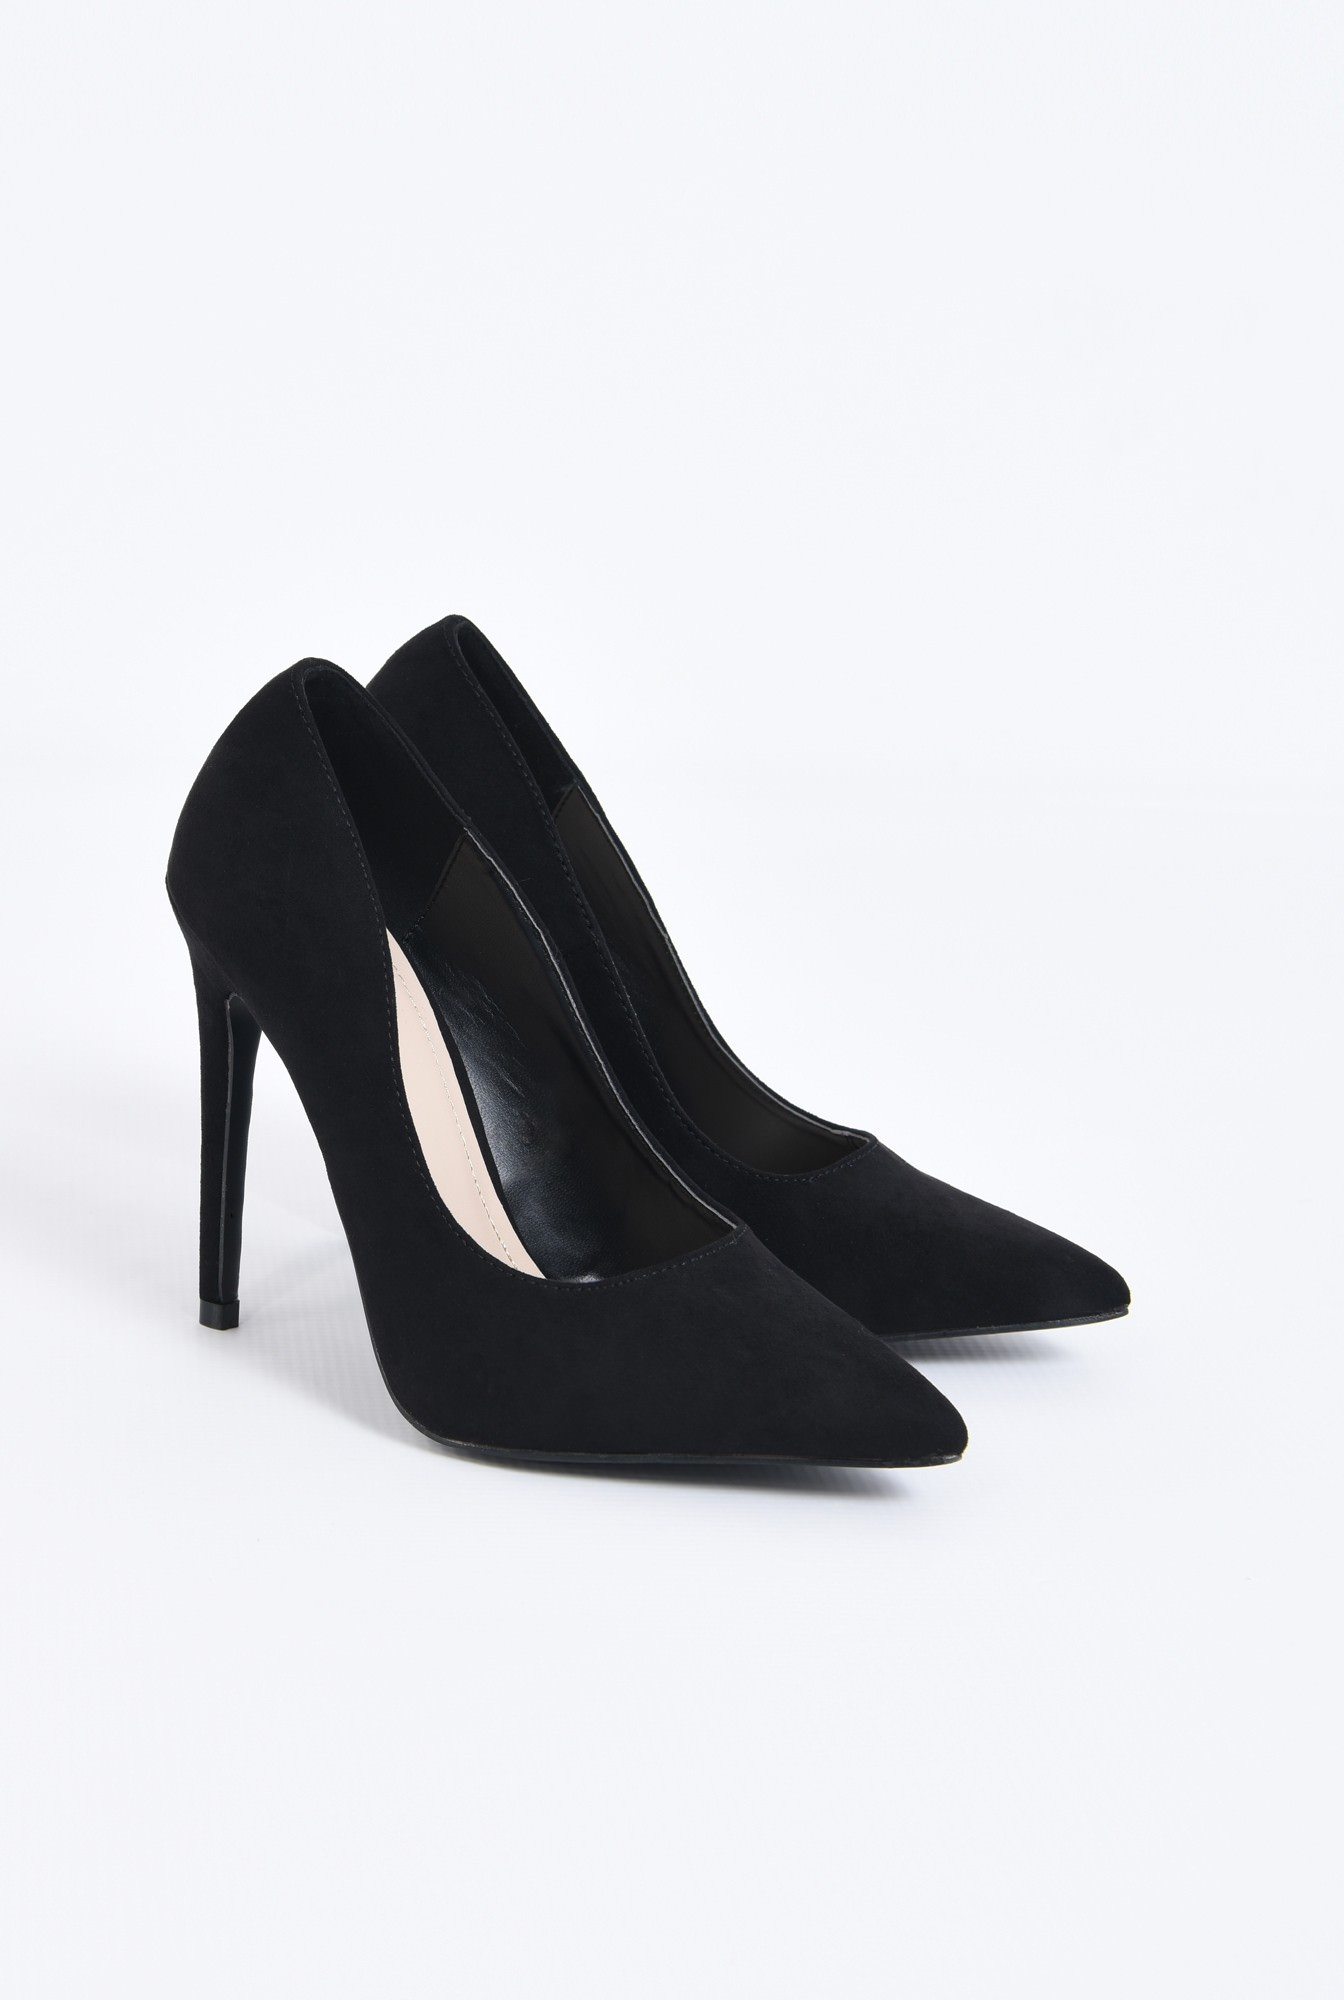 1 - pantofi de ocazie, varf ascutit, toc inalt